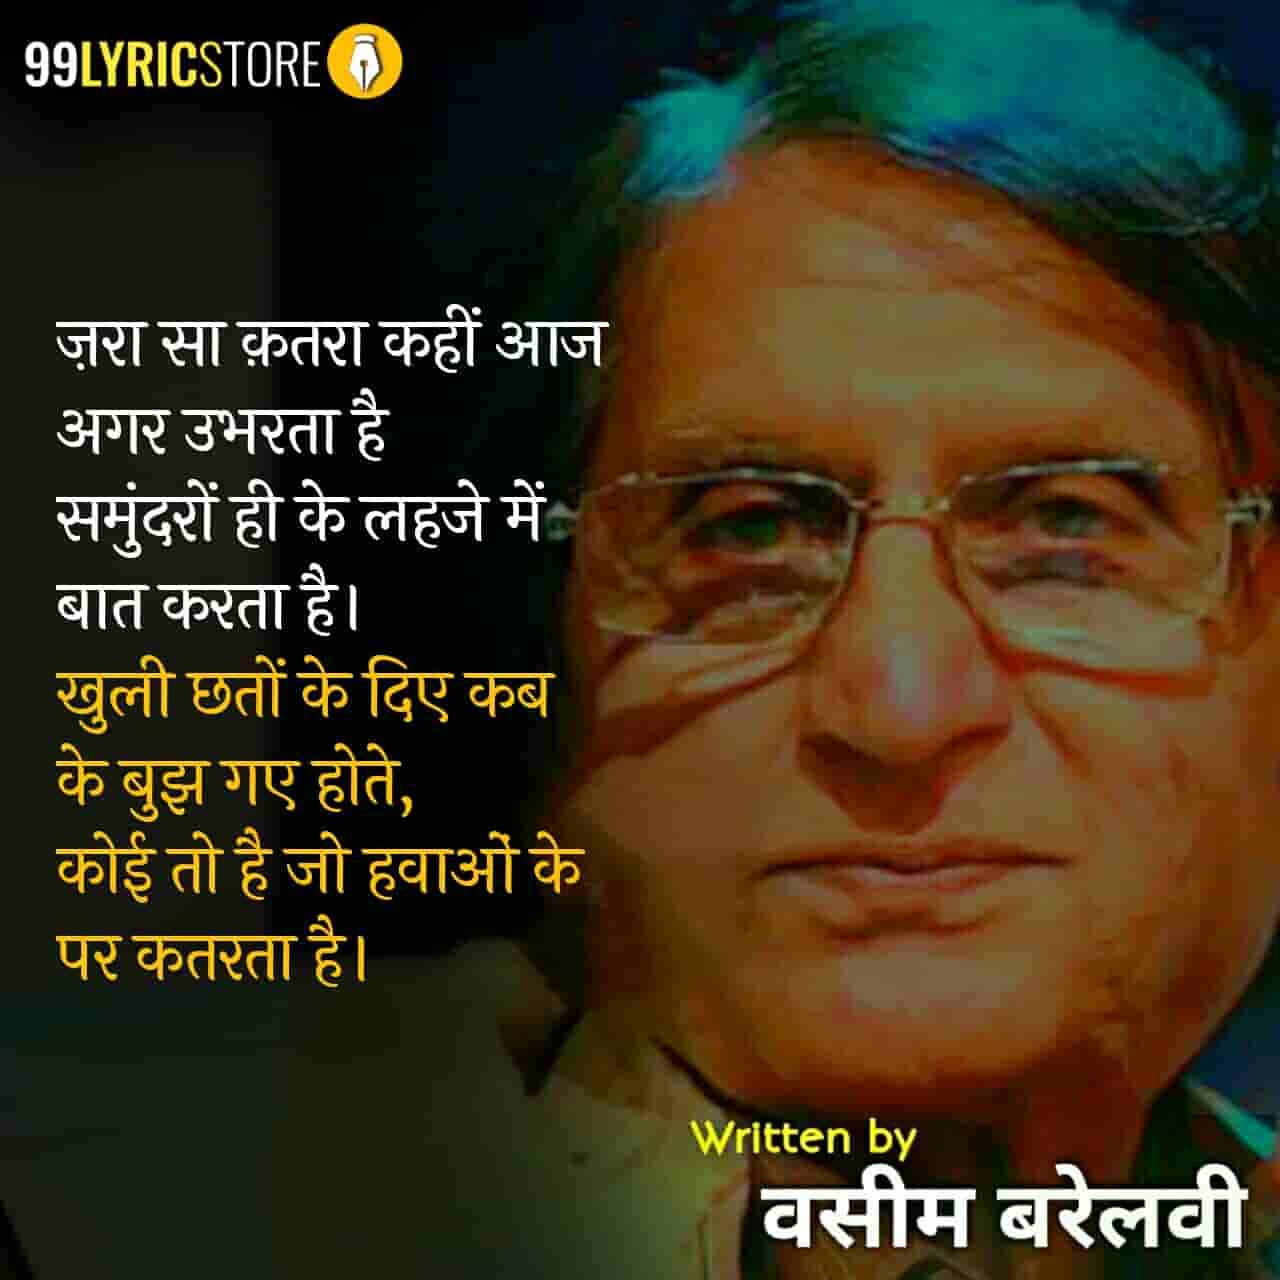 This beautiful ghazal 'Zara Sa Qatra Kahin Aaj Agar Ubharta Hai' has written by Waseem Barelvi.